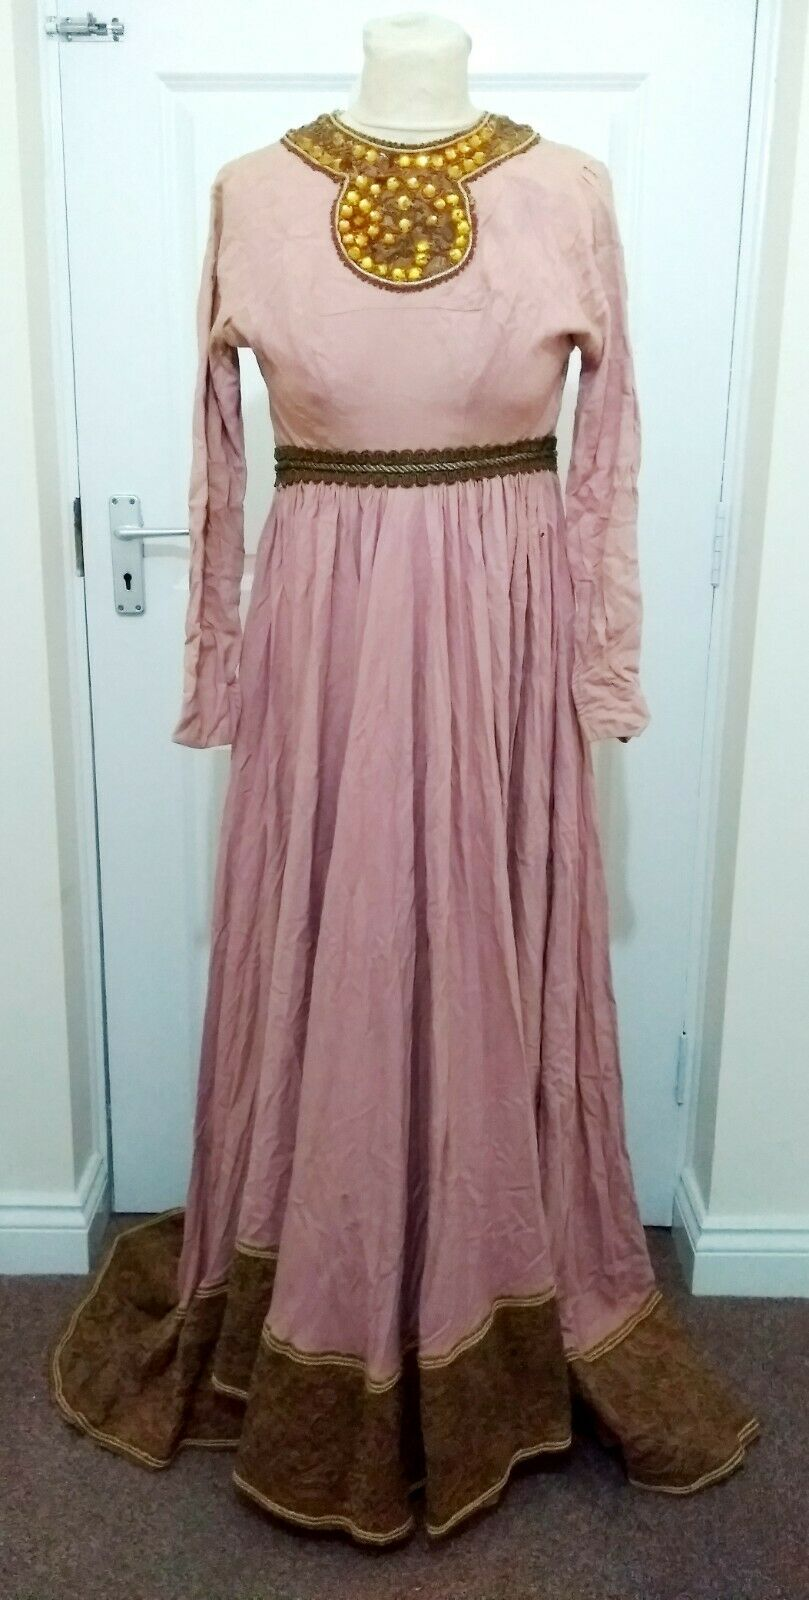 Vintage Ladies Medieval Costume - Pink - Size XS - Western Costume Co.